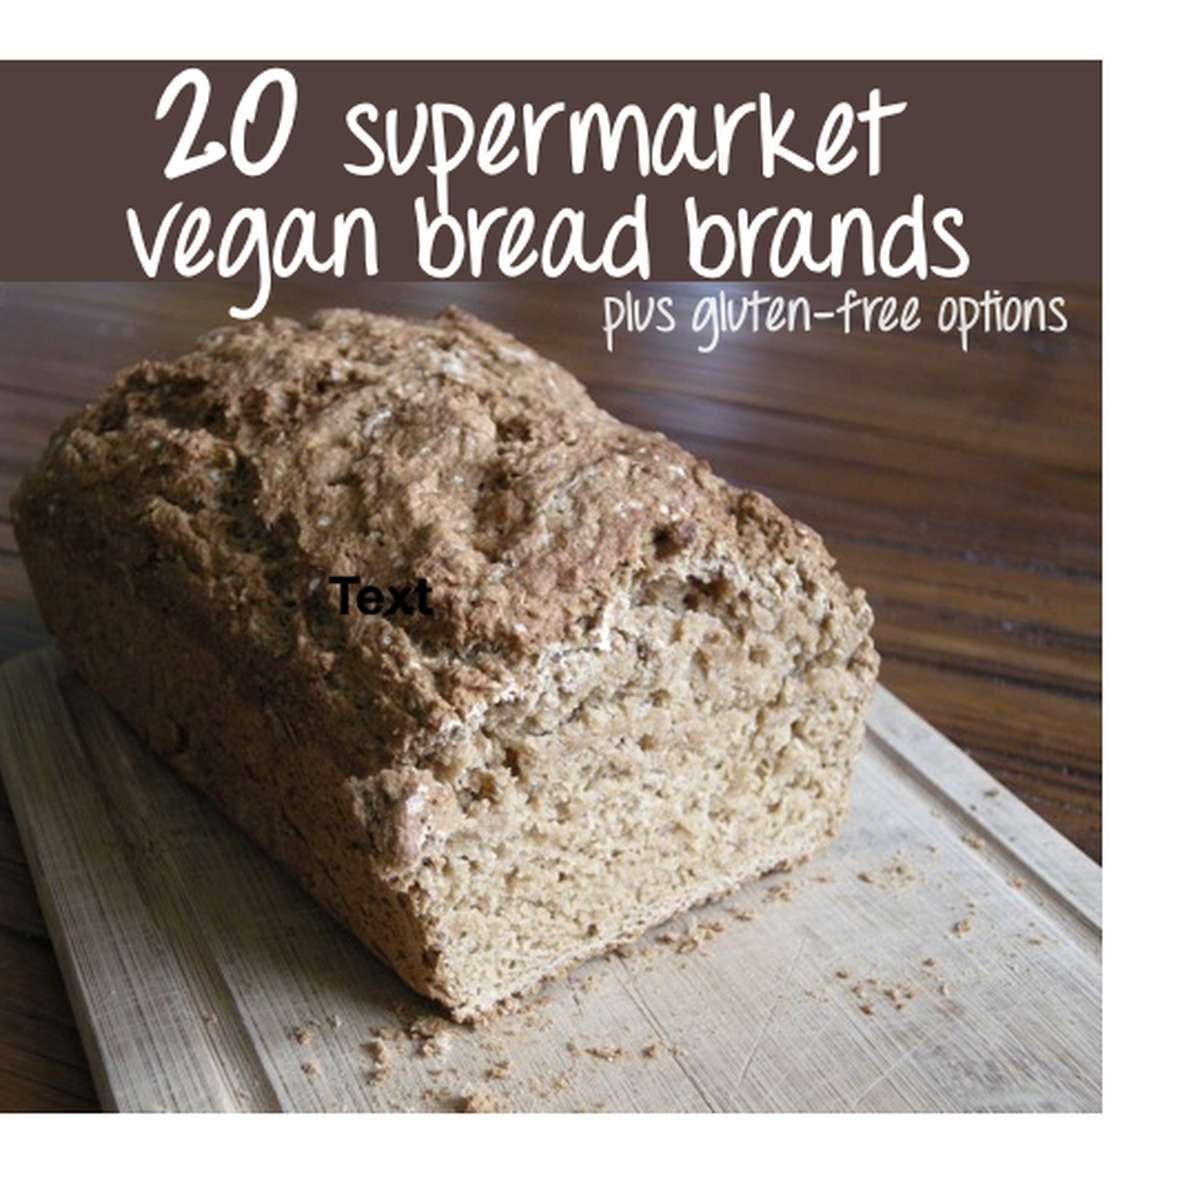 Vegan Gluten Free Bread Brands  List of 20 Supermarket Friendly Vegan Bread Brands inc